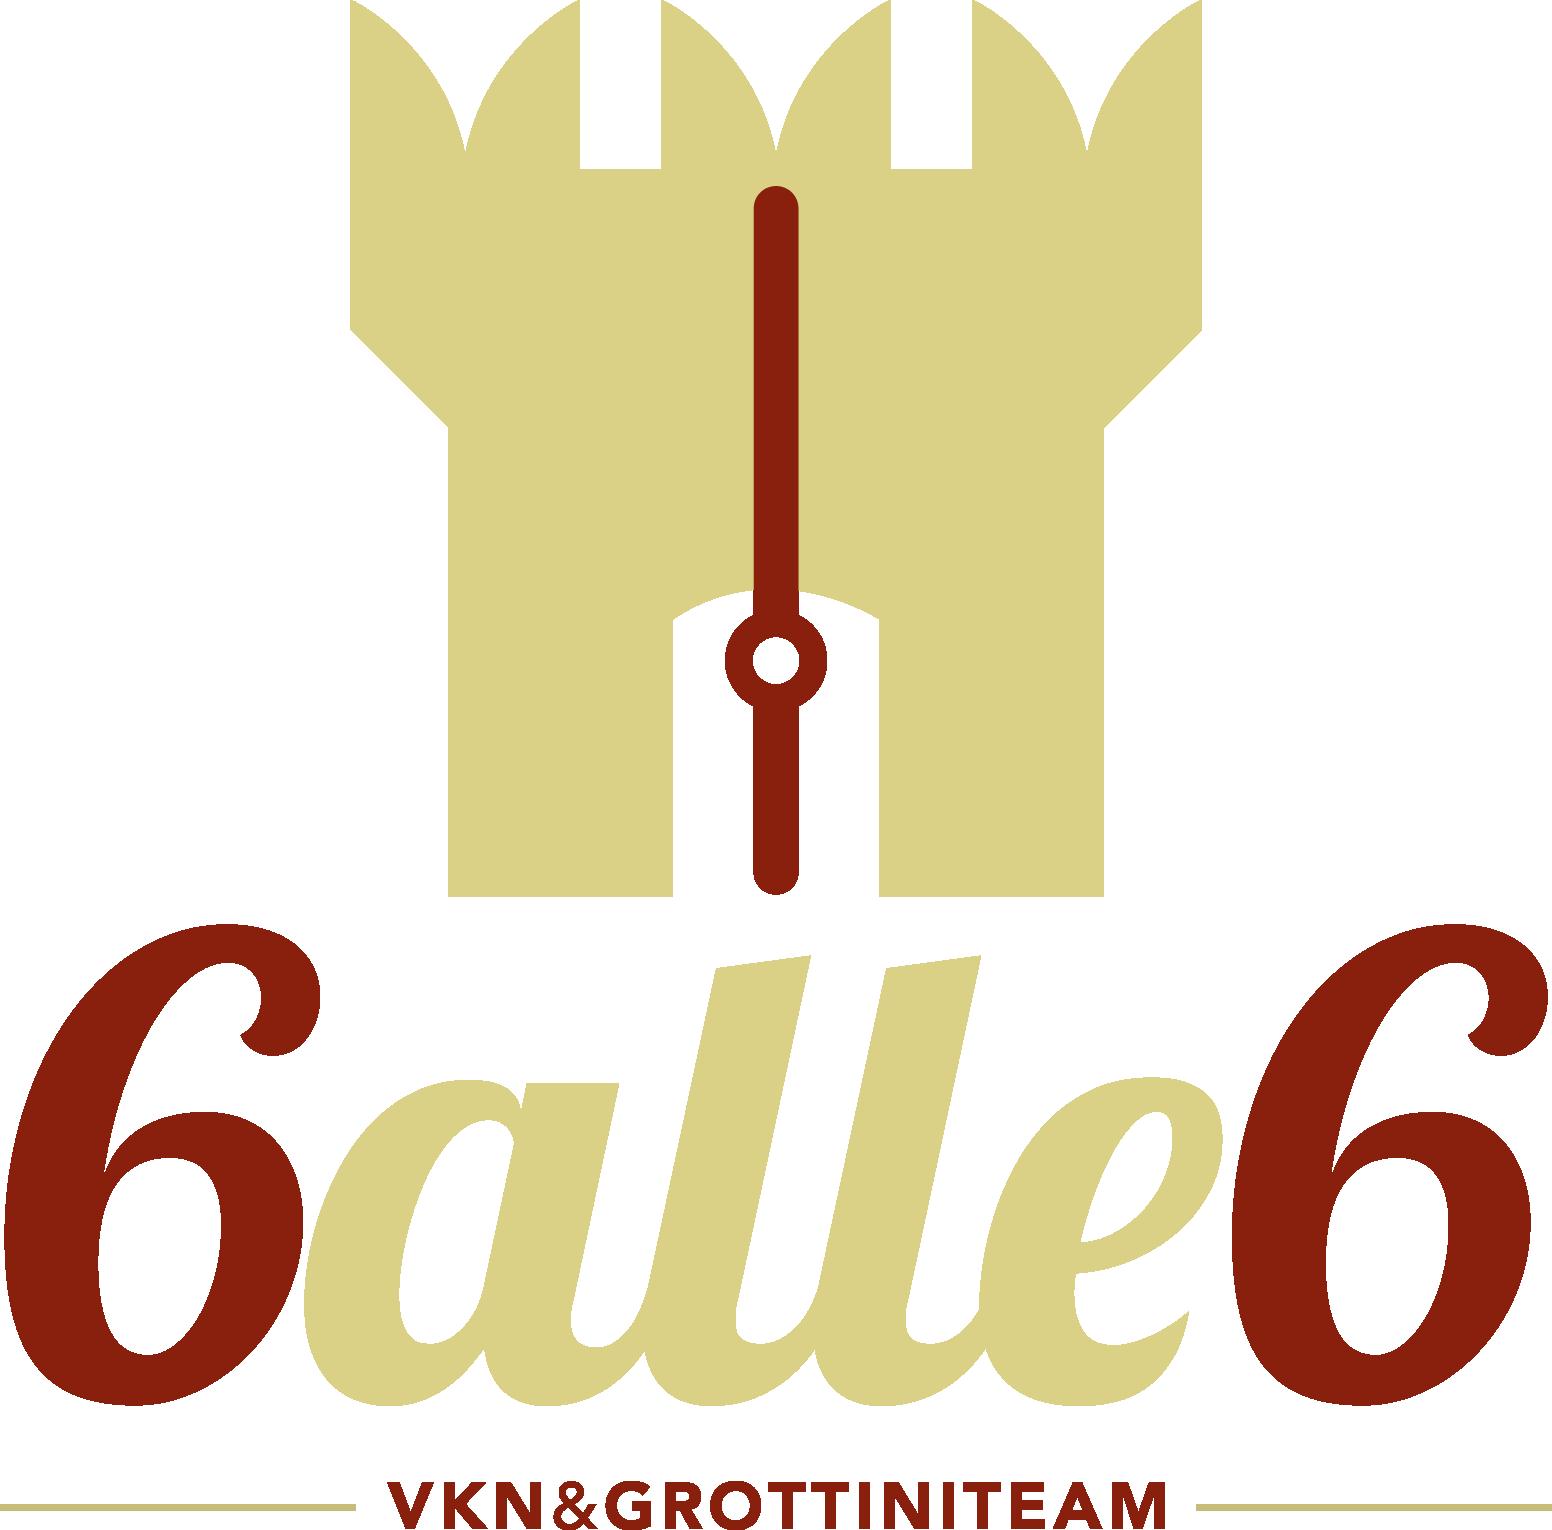 6alle6